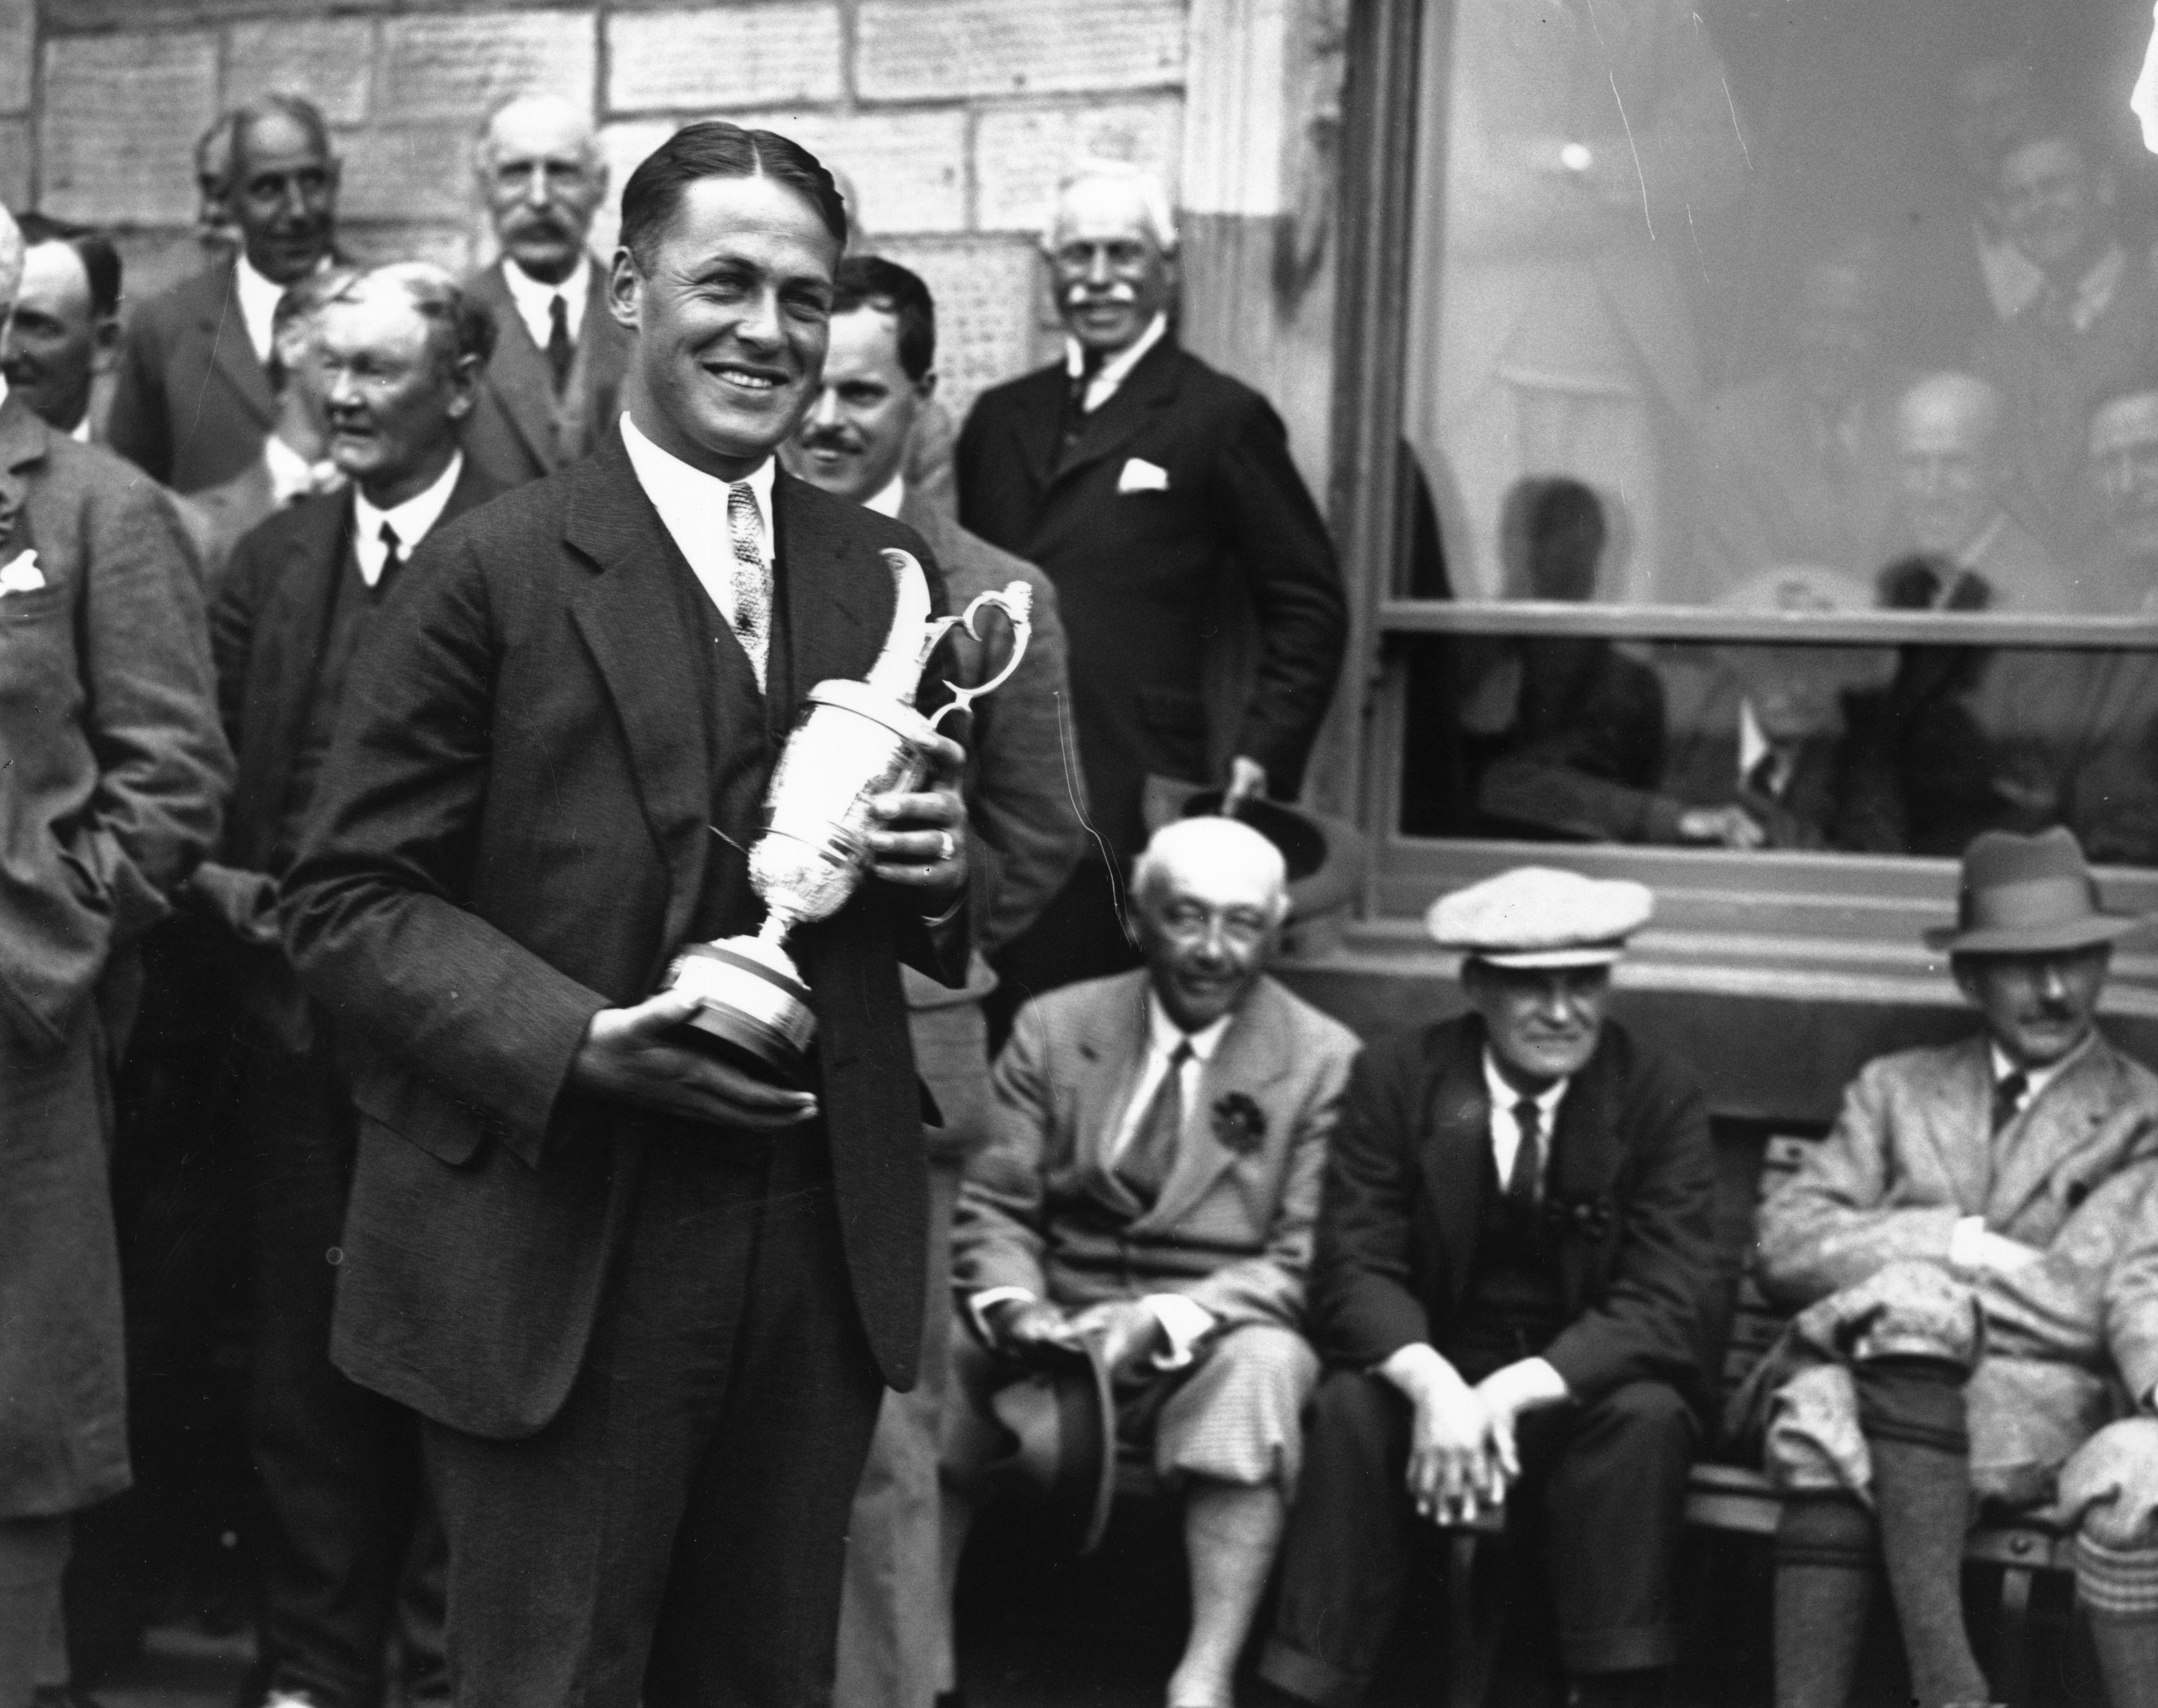 Bobby Jones at the 1927 Open Championship.